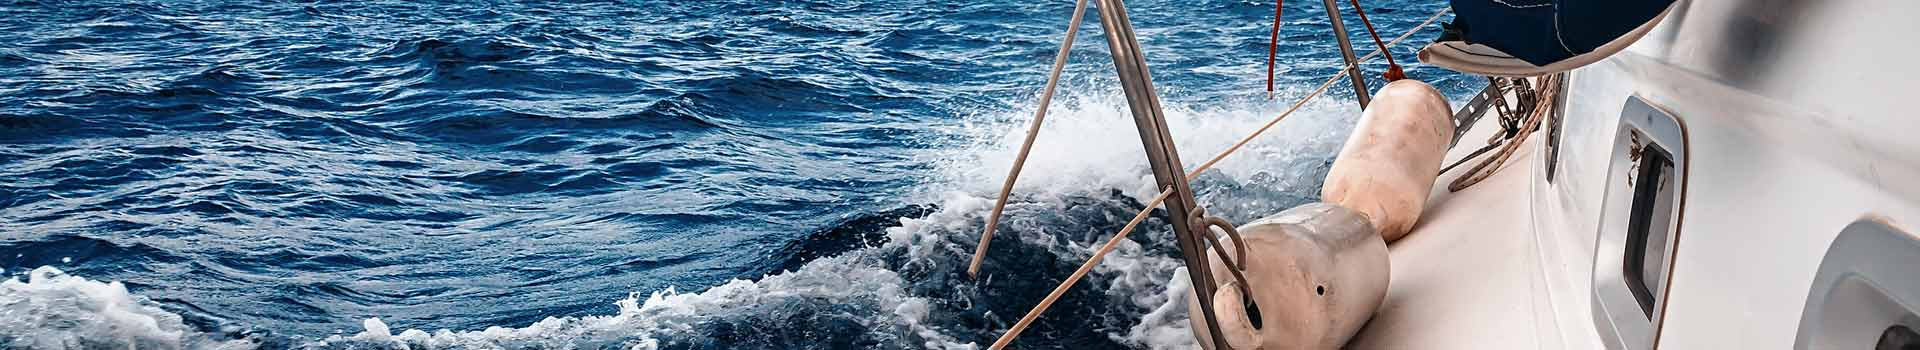 callaghans marine services volvo penta hero image